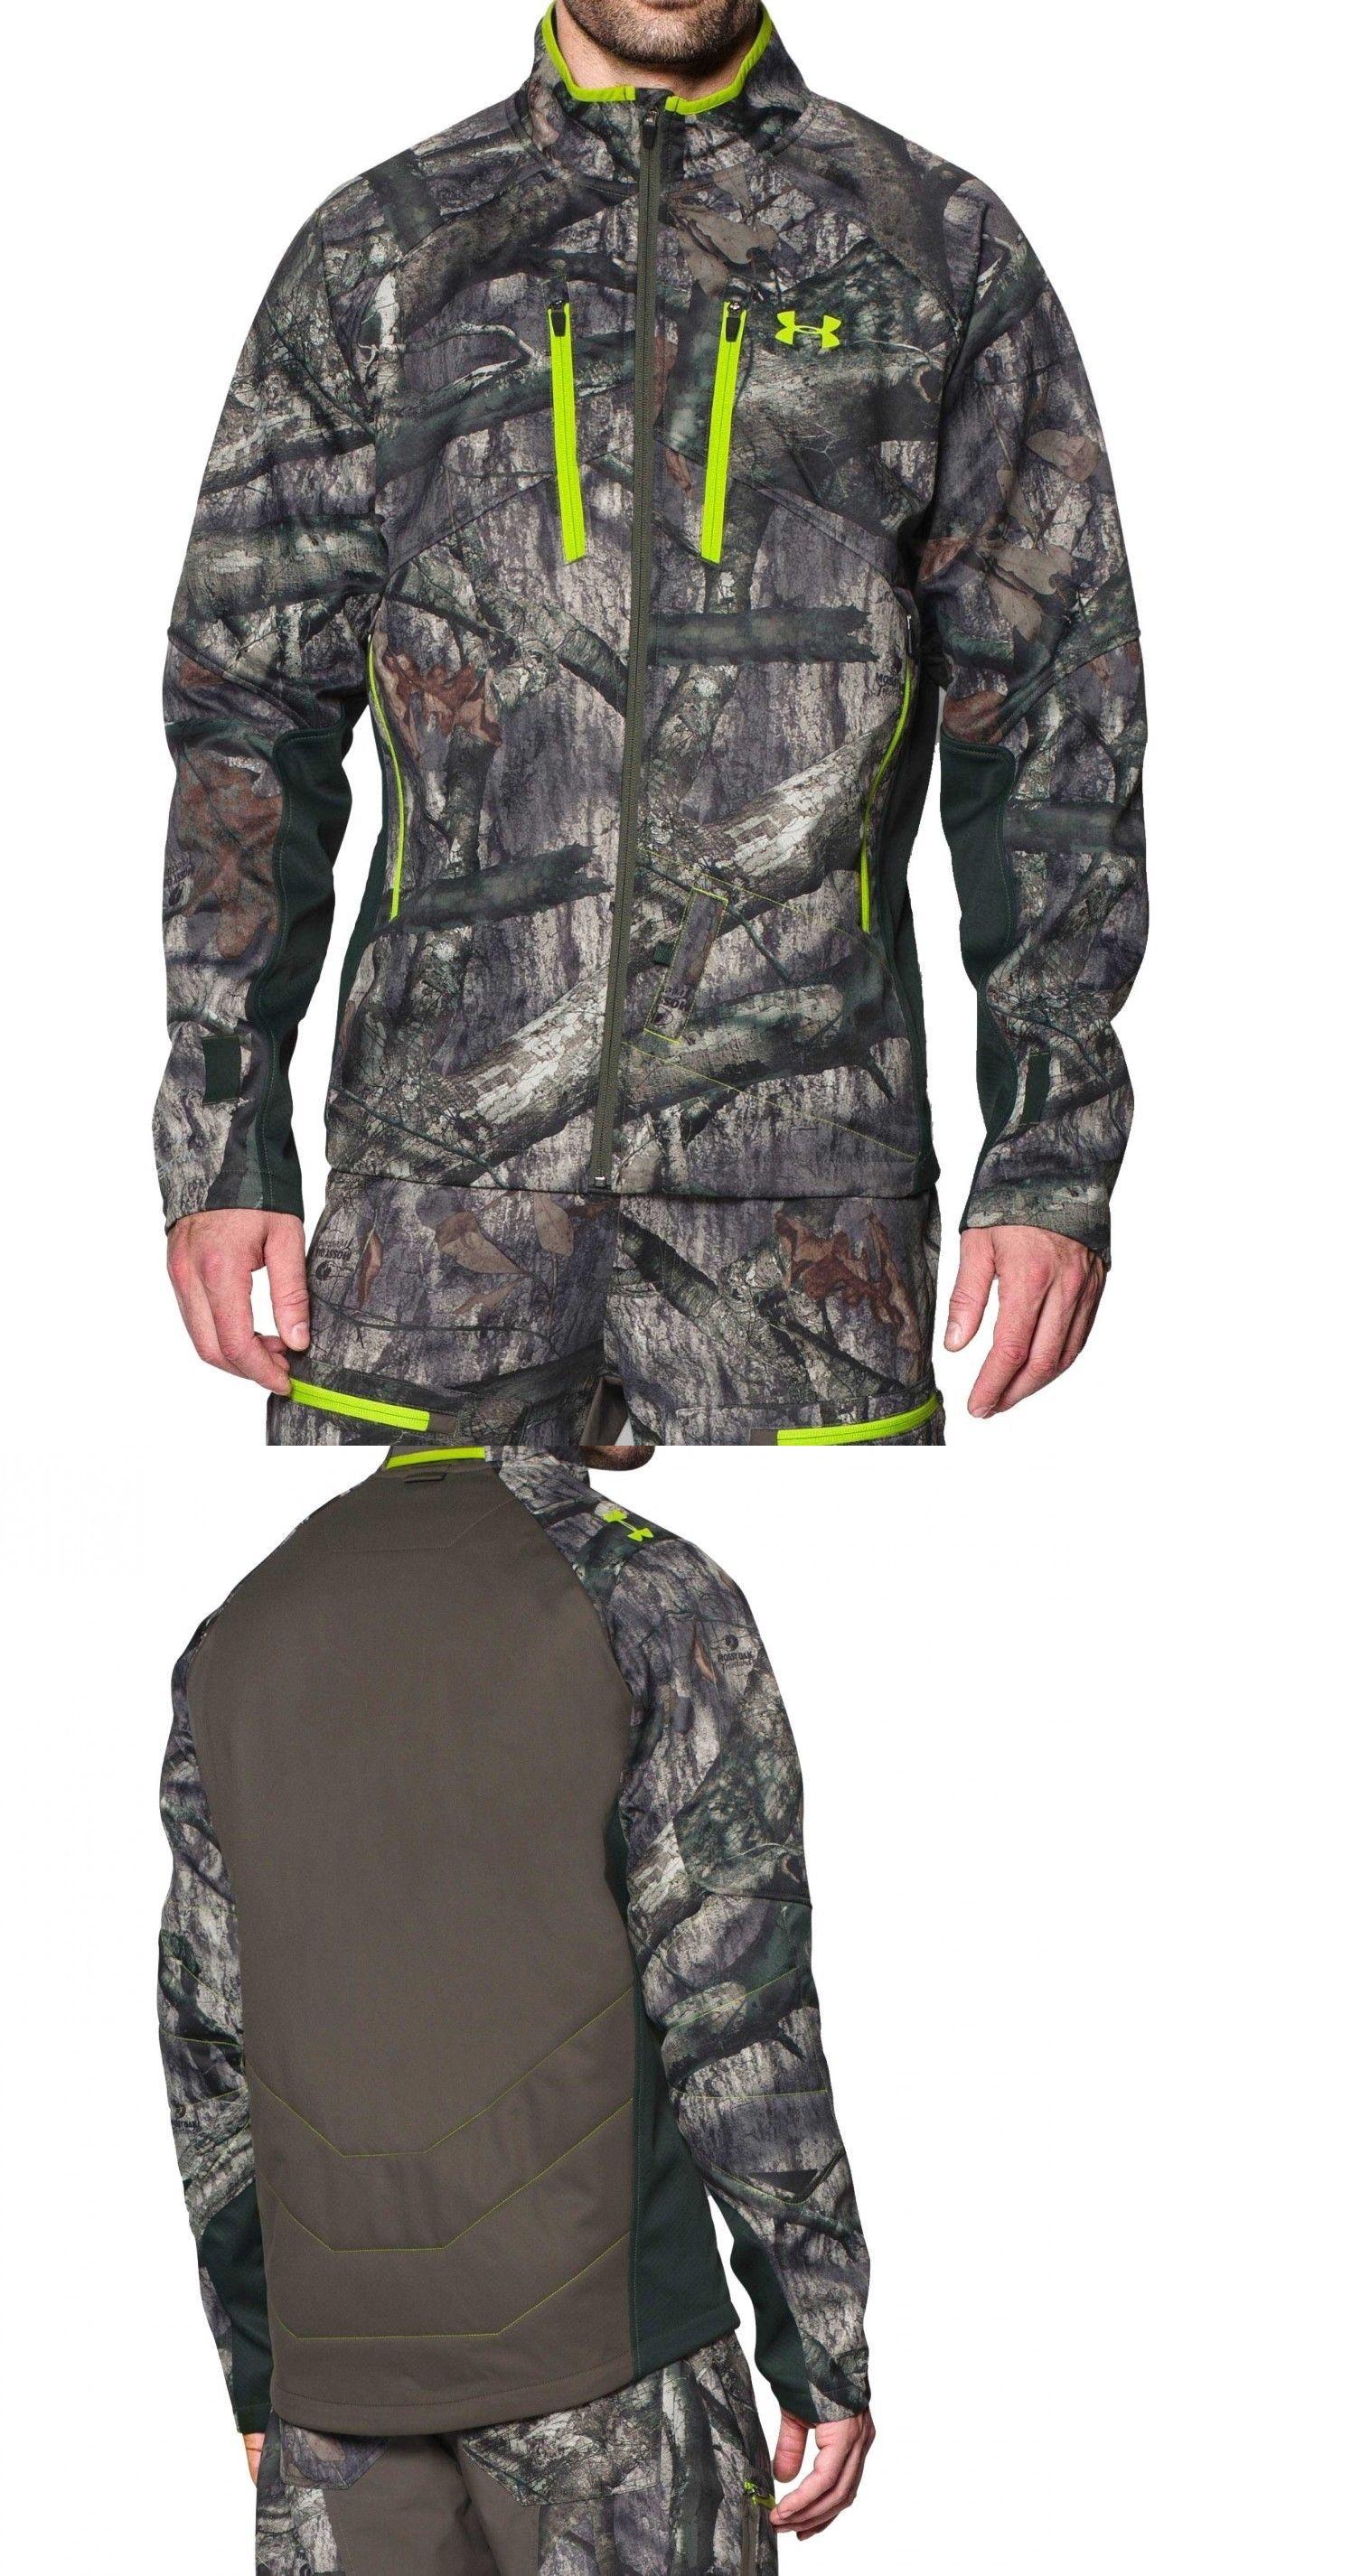 under armour mossy oak treestand jacket